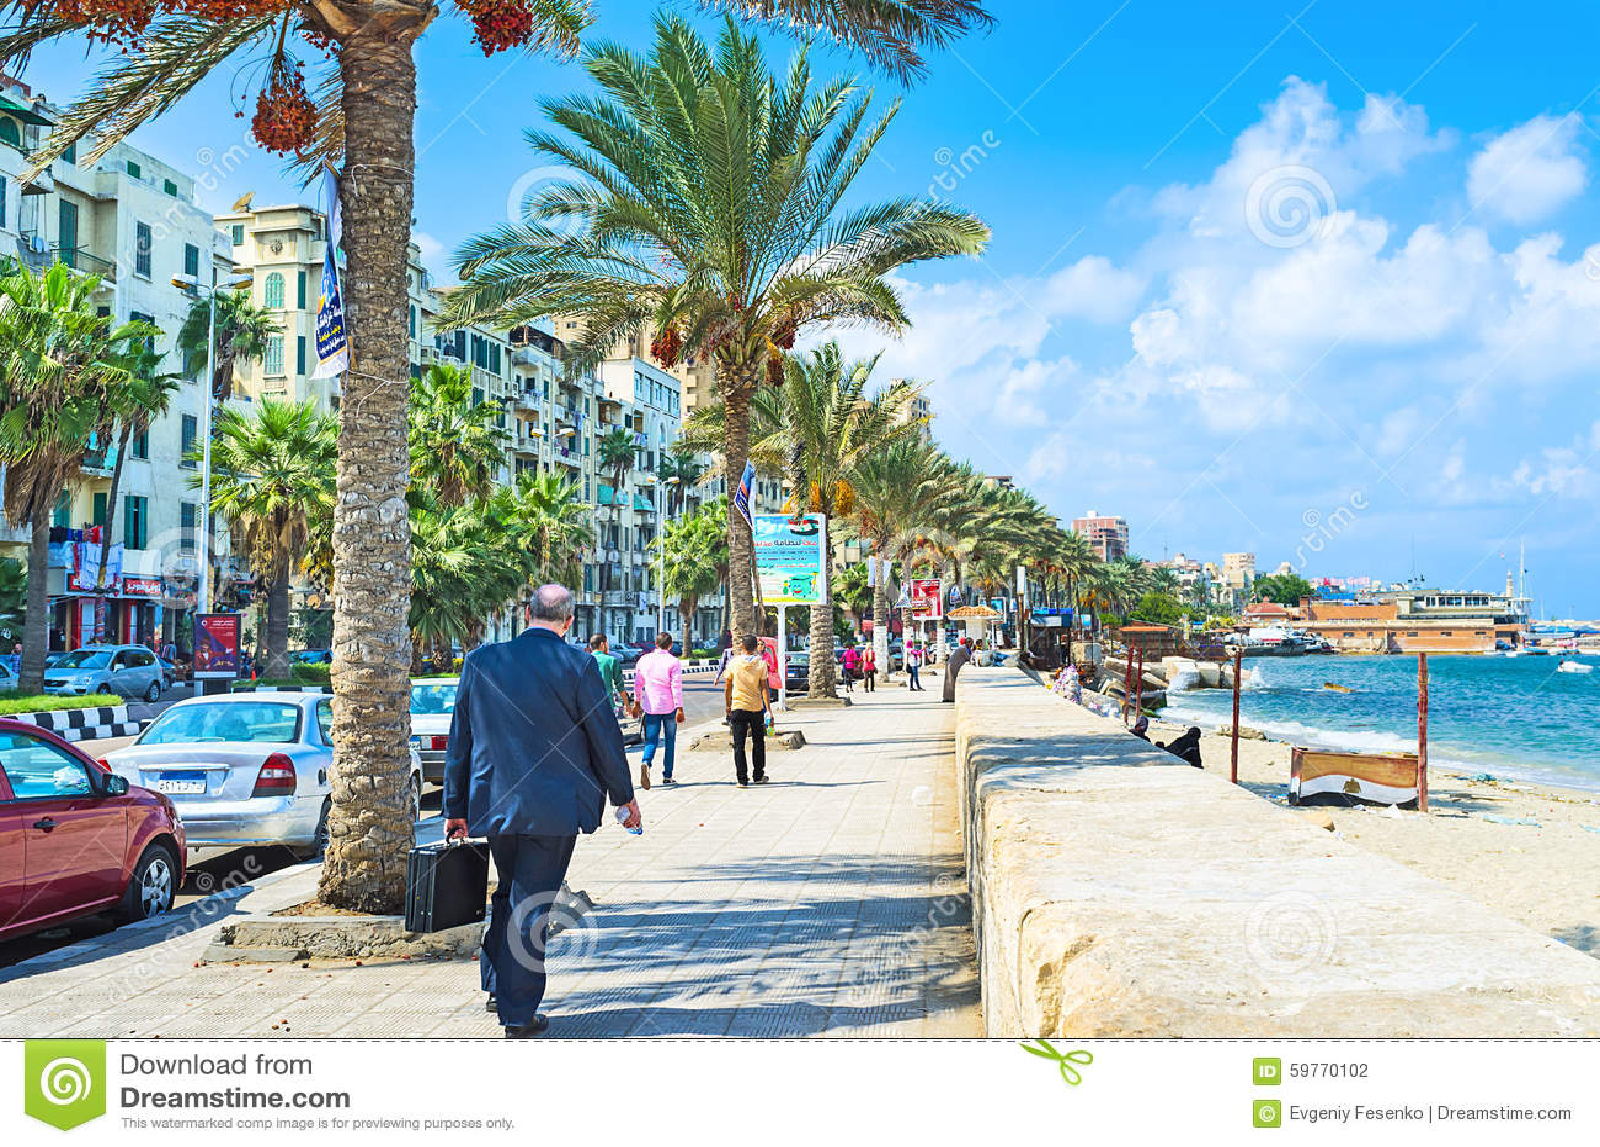 Cafes In Alexandria On The Beach